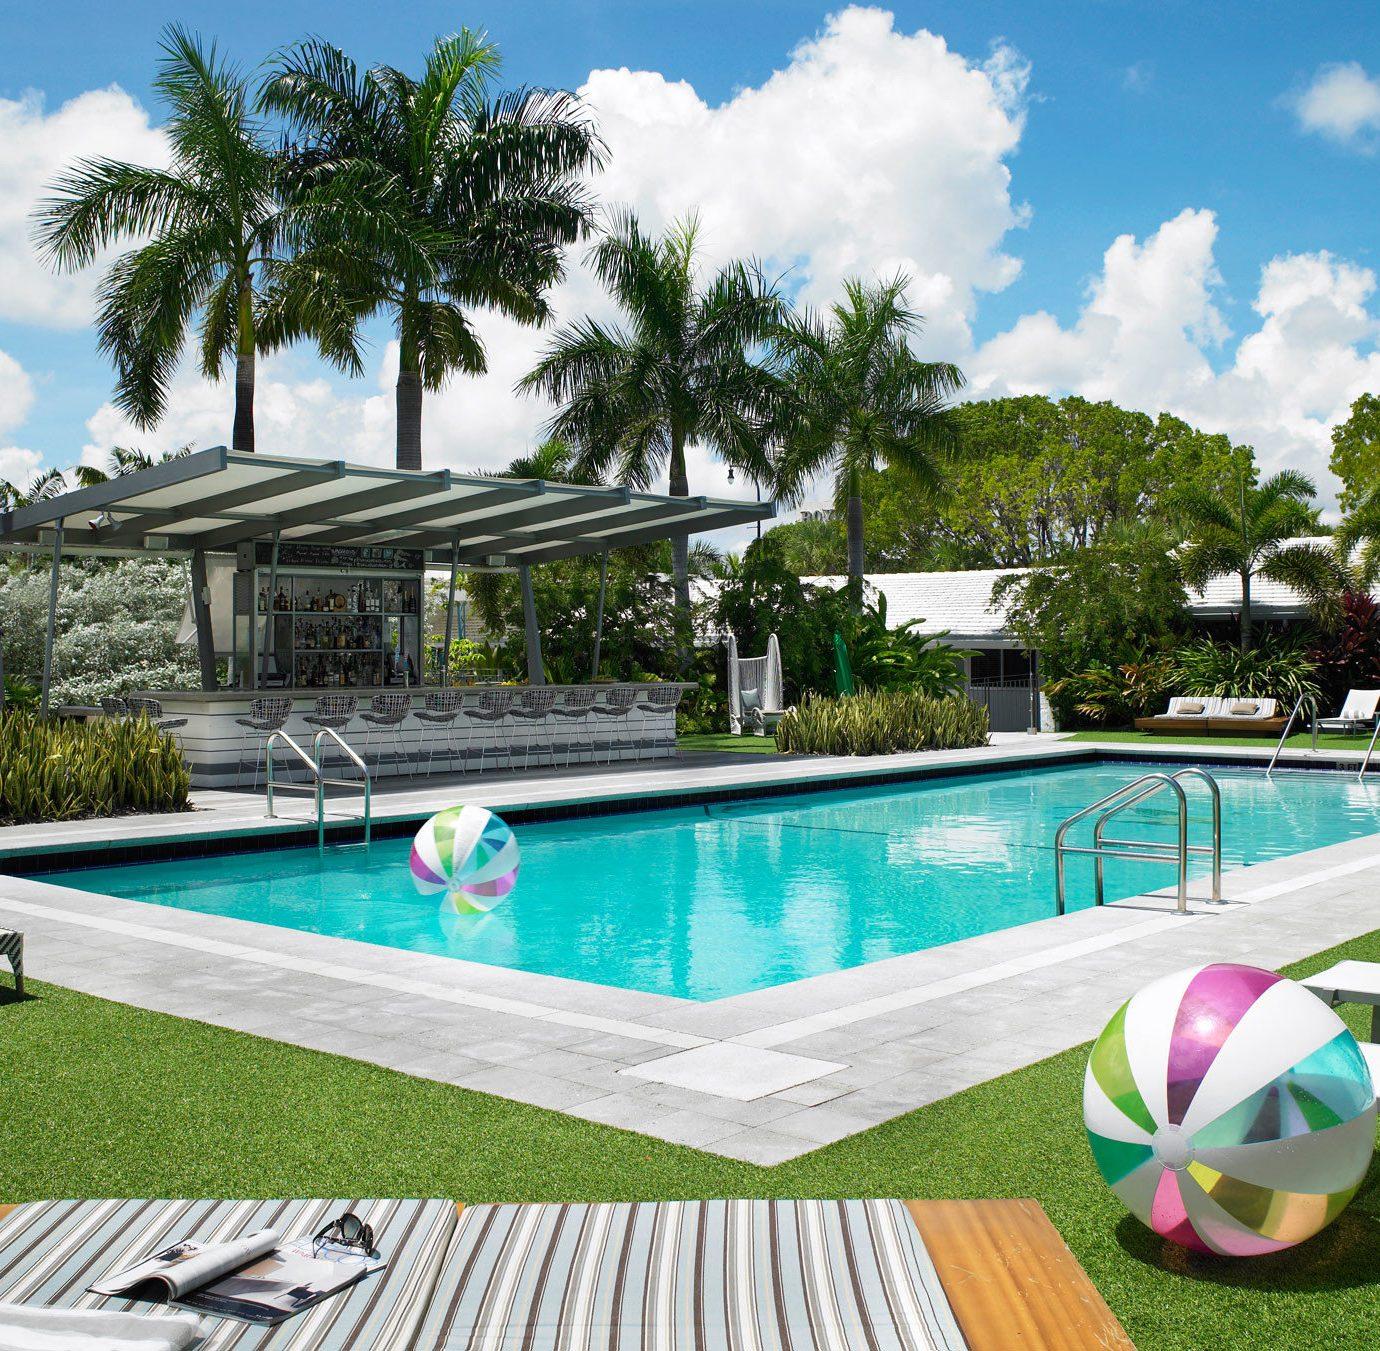 Trip Ideas tree grass swimming pool leisure property Villa backyard Resort green home condominium Pool park mansion